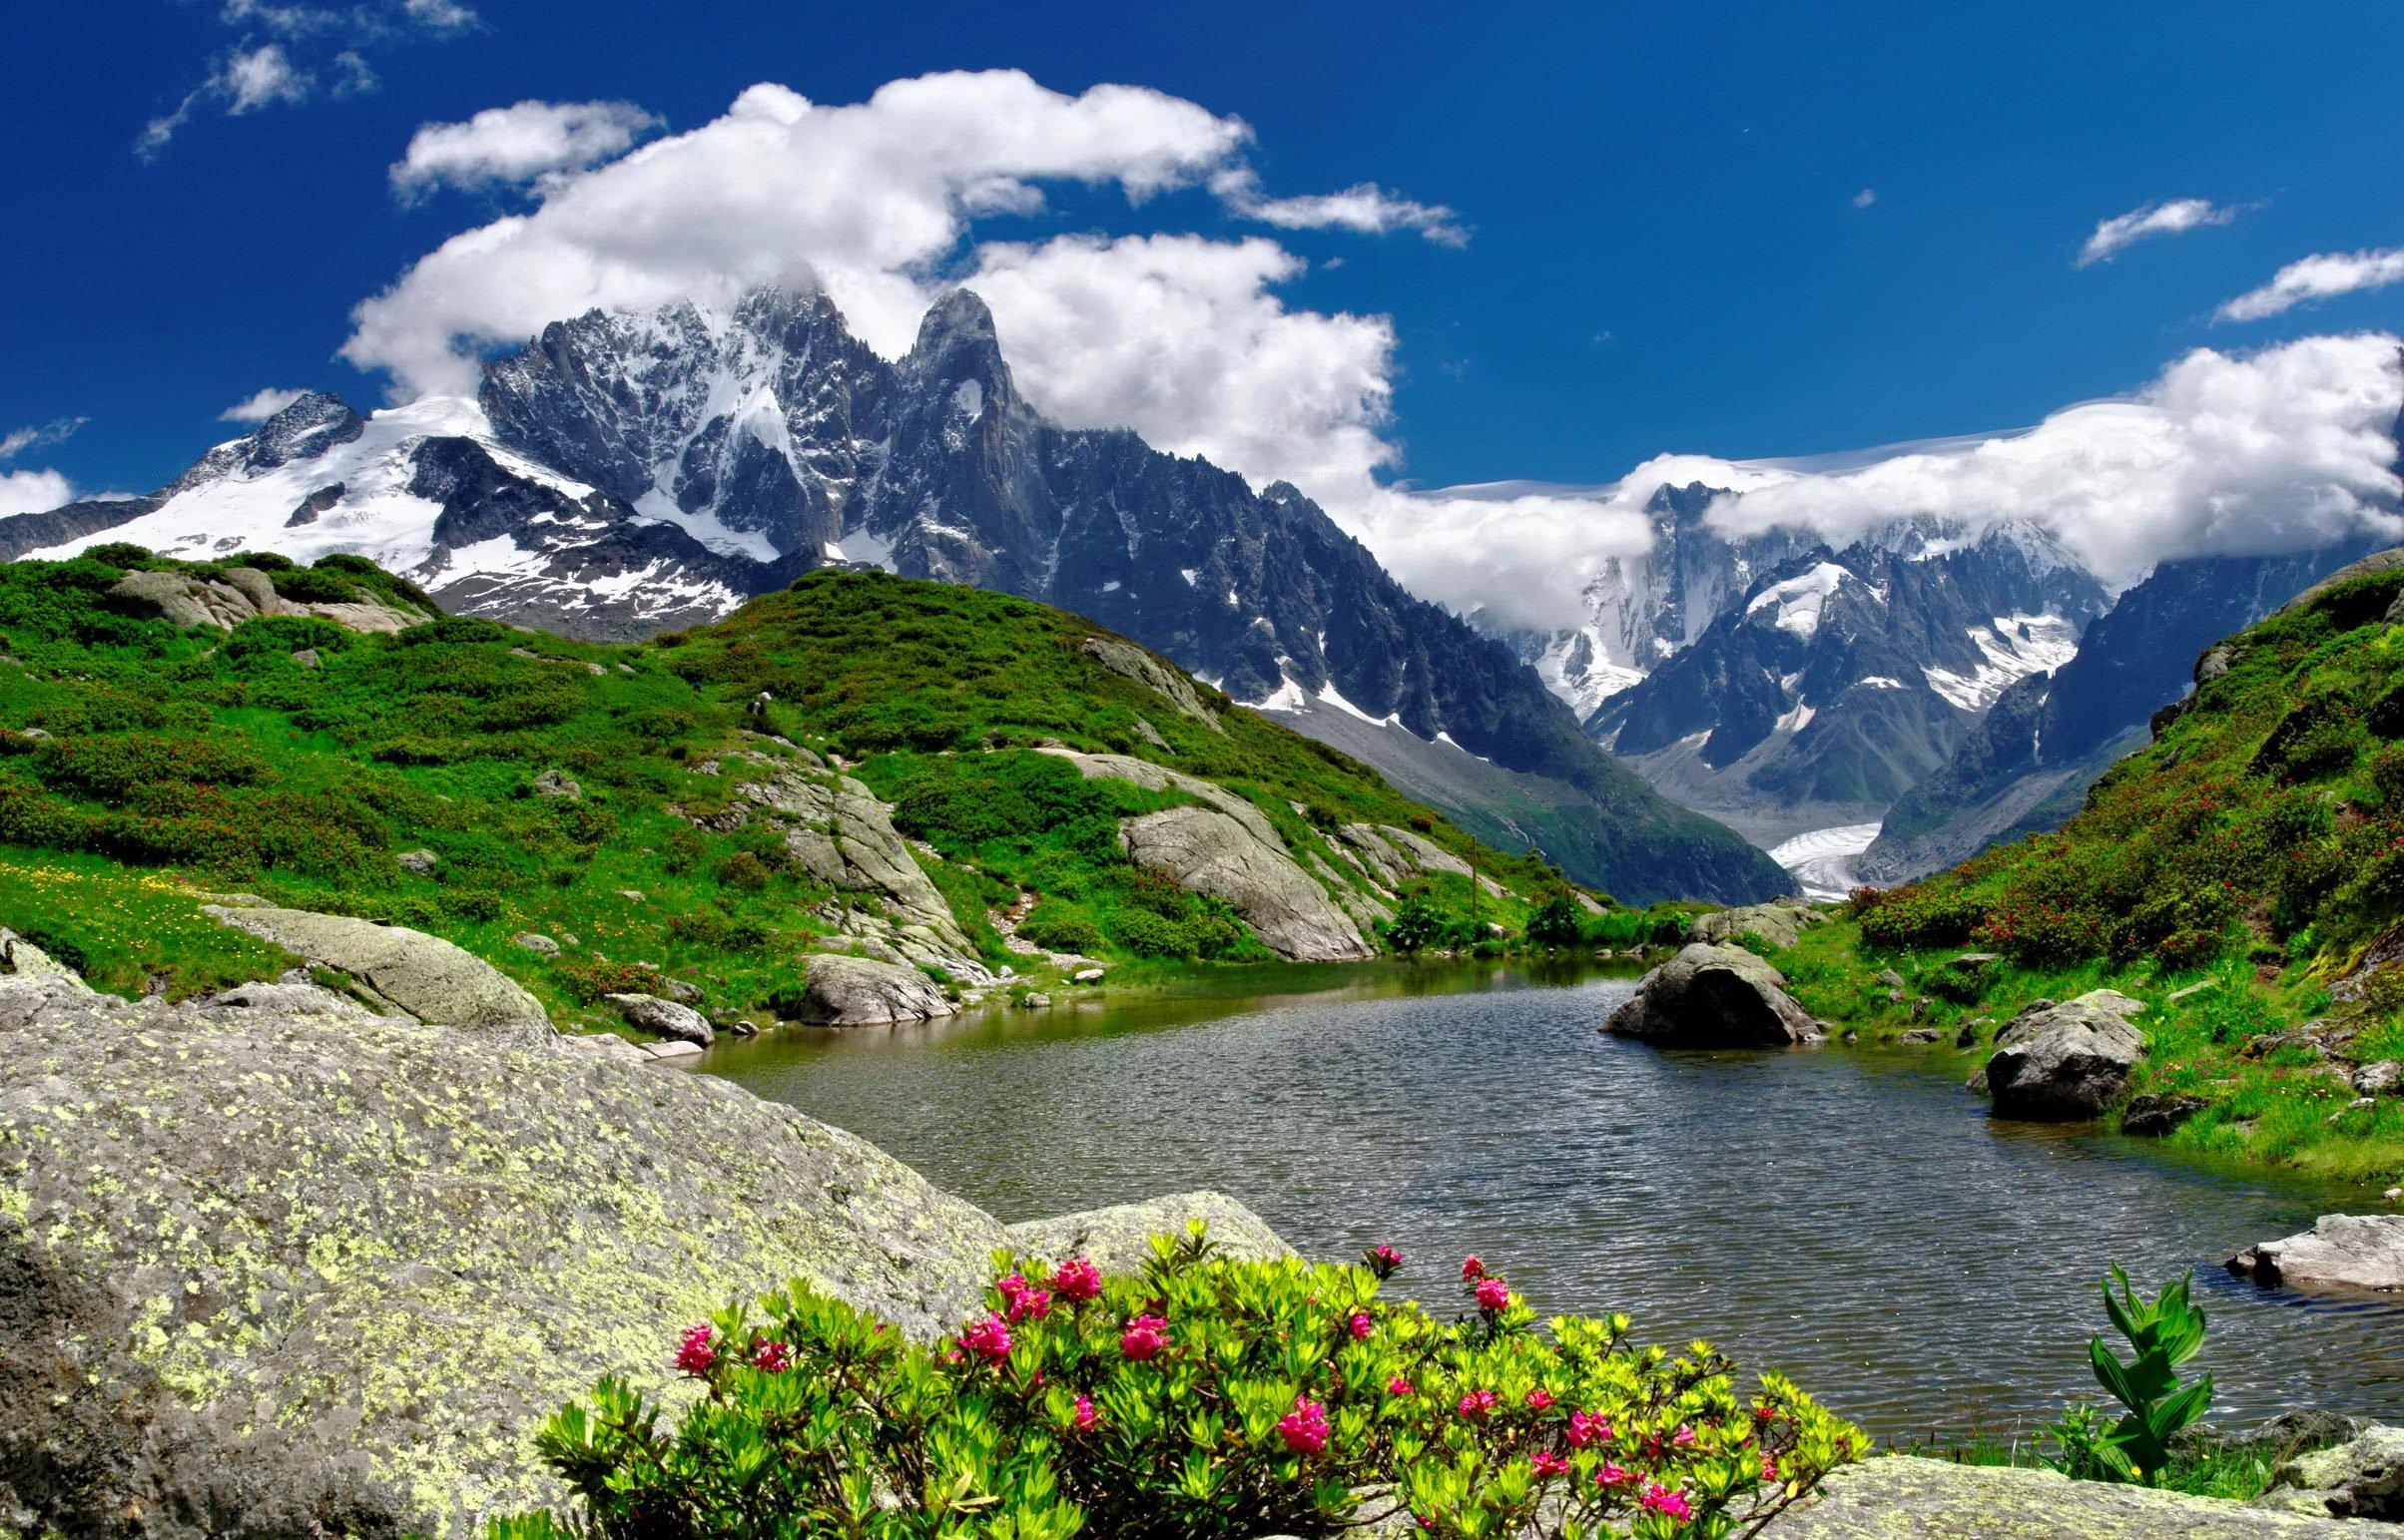 River With Mountain Hd Wallpaper: Mountain River Wallpaper